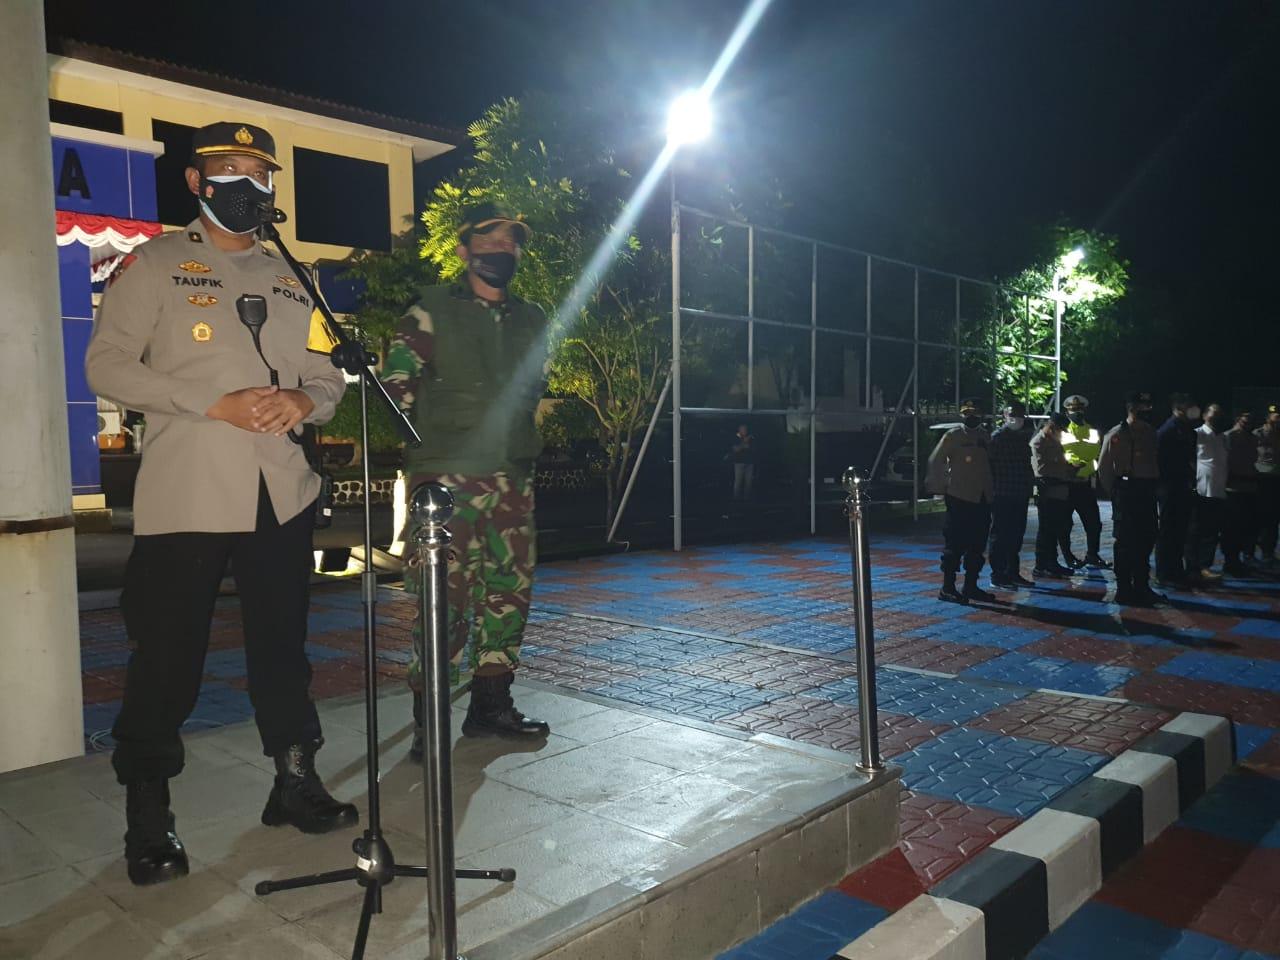 Polres Majalengka Gelar Apel Kesiapan Pengamanan Malam Takbiran Idul Adha 1442 H